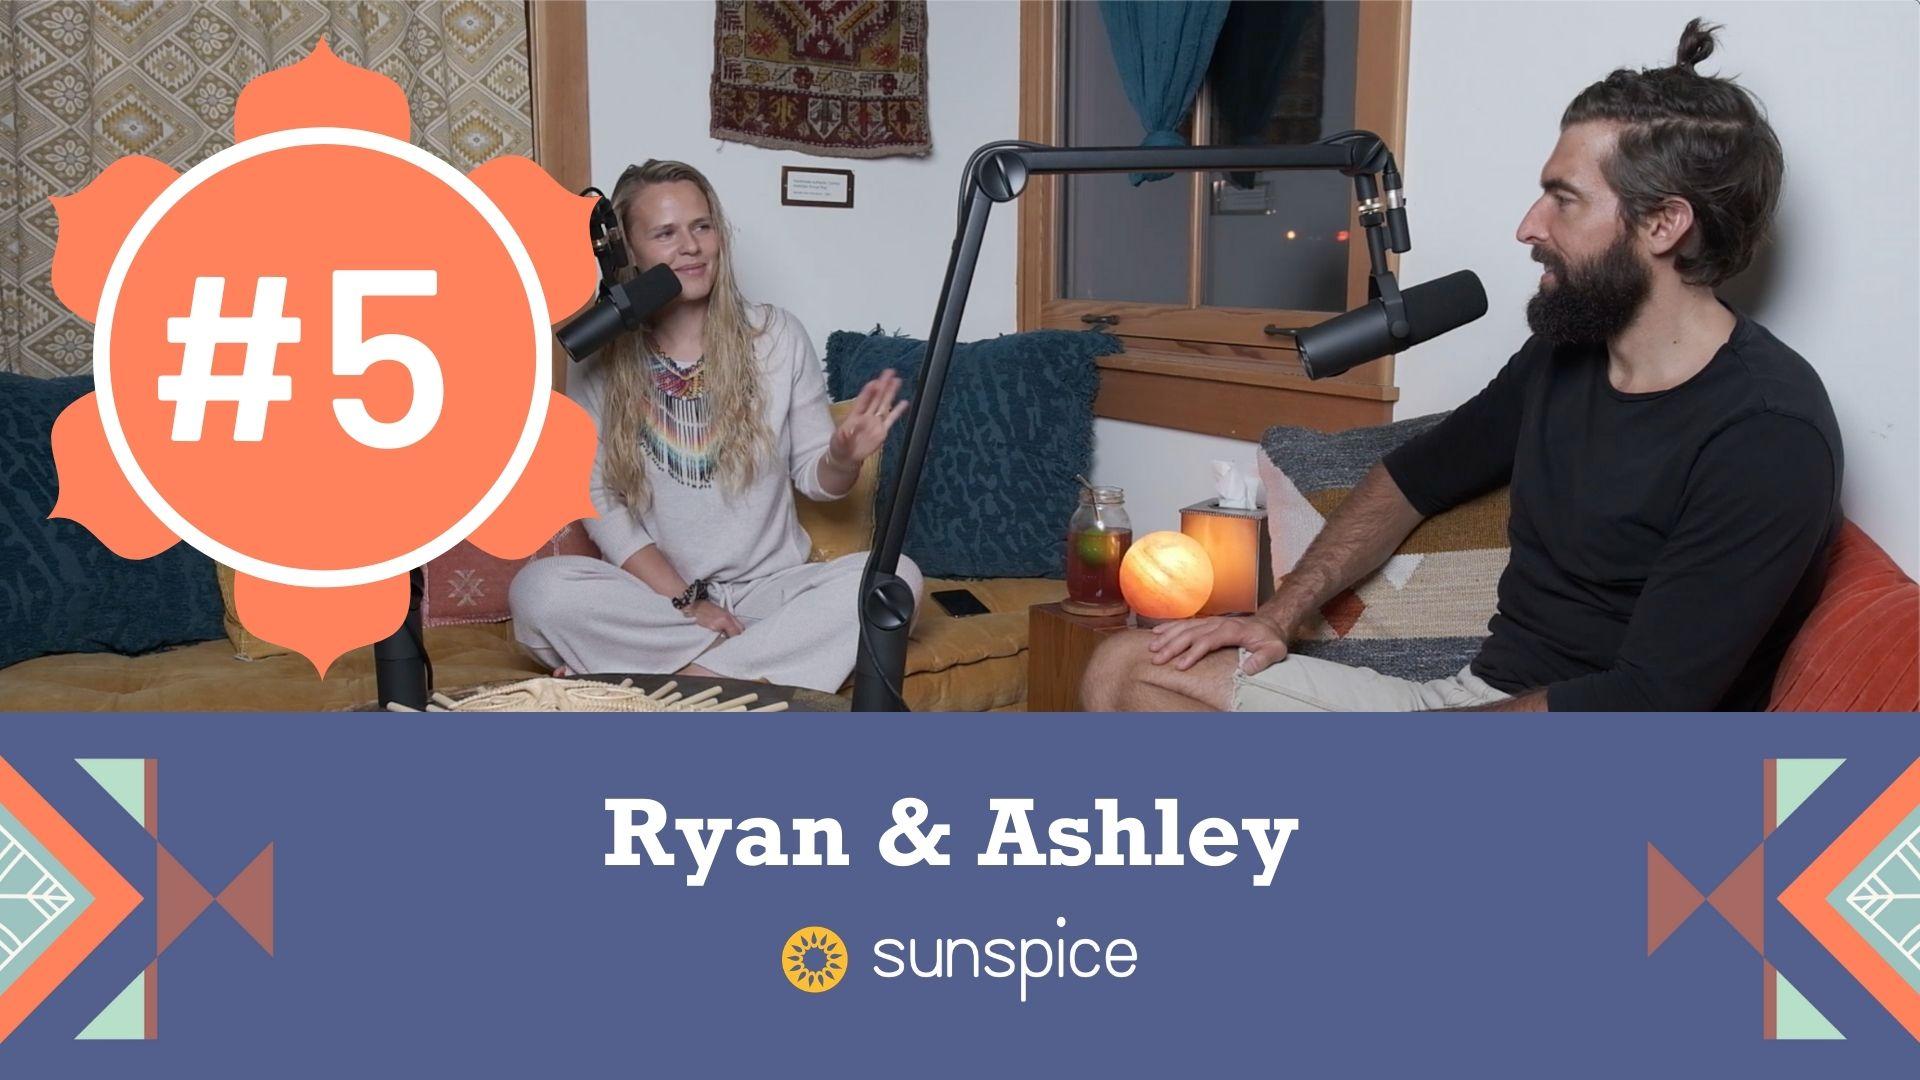 #5 Ryan Sheffer: Ashley and her husband discuss intimacy and trauma